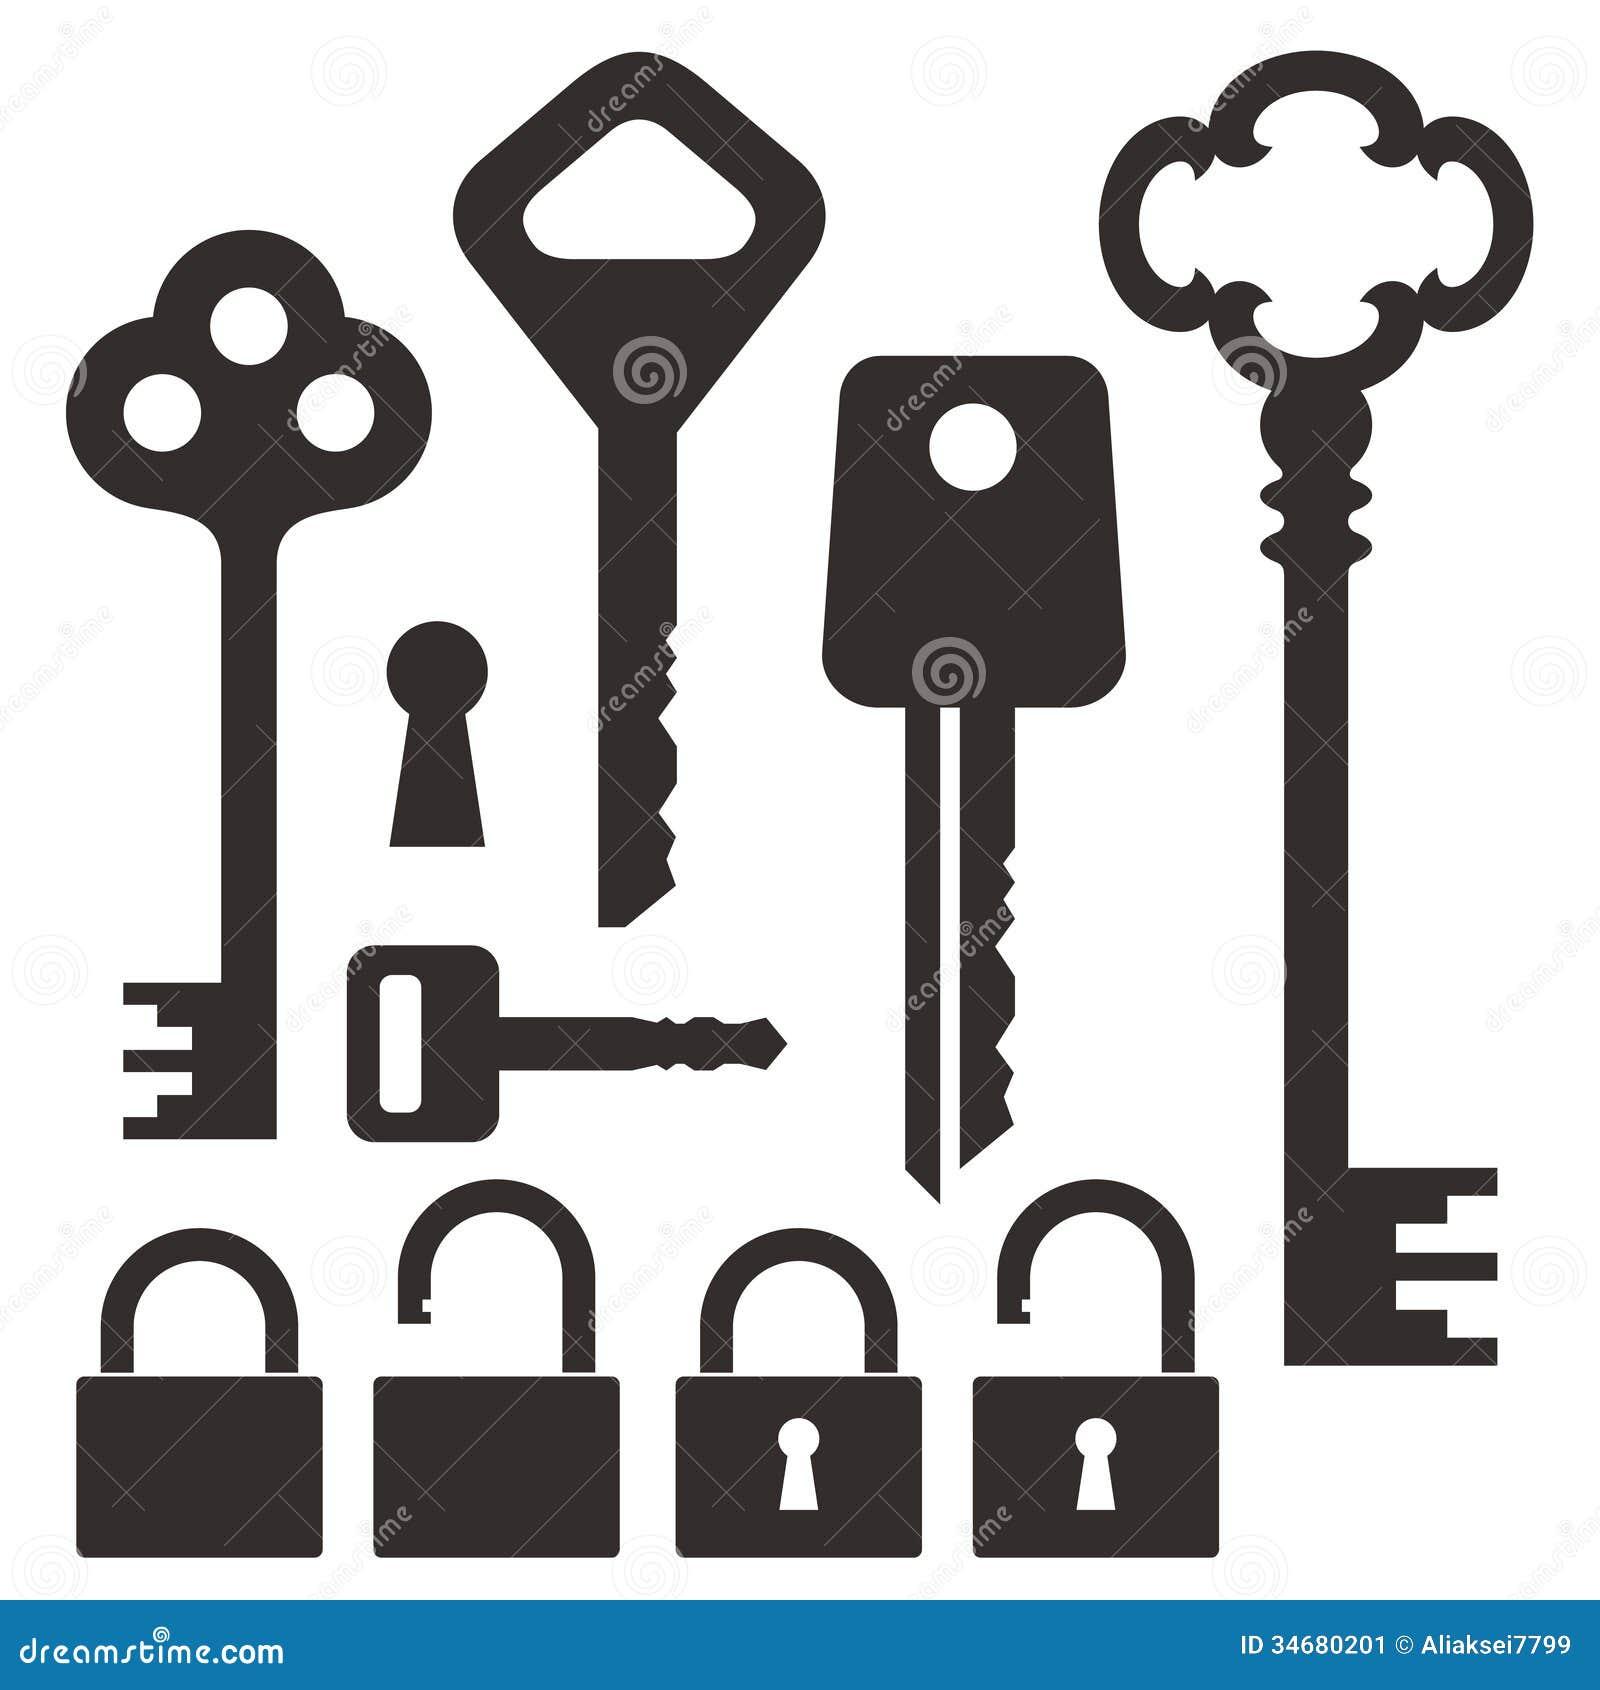 Vector Key Illustration: Key. Lock Stock Vector. Illustration Of Element, Skeleton